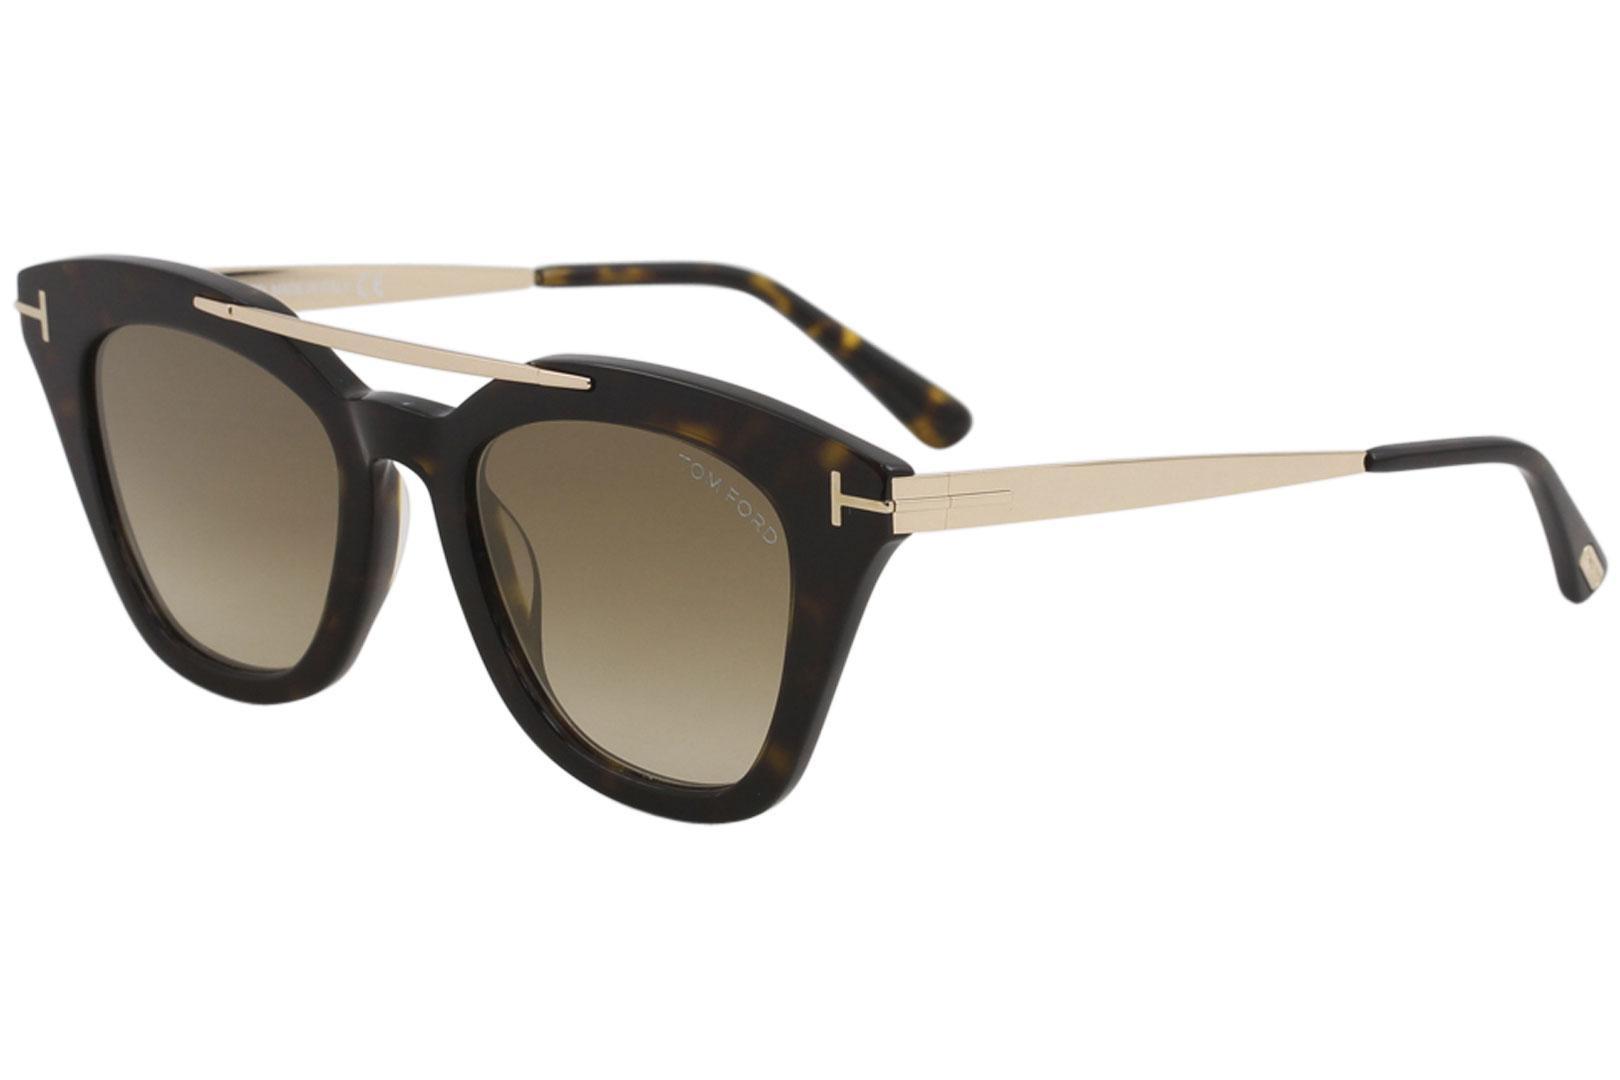 7fc7dfa9a210d Tom Ford Women s Anna-02 TF575 TF 575 Fashion Cat Eye Sunglasses